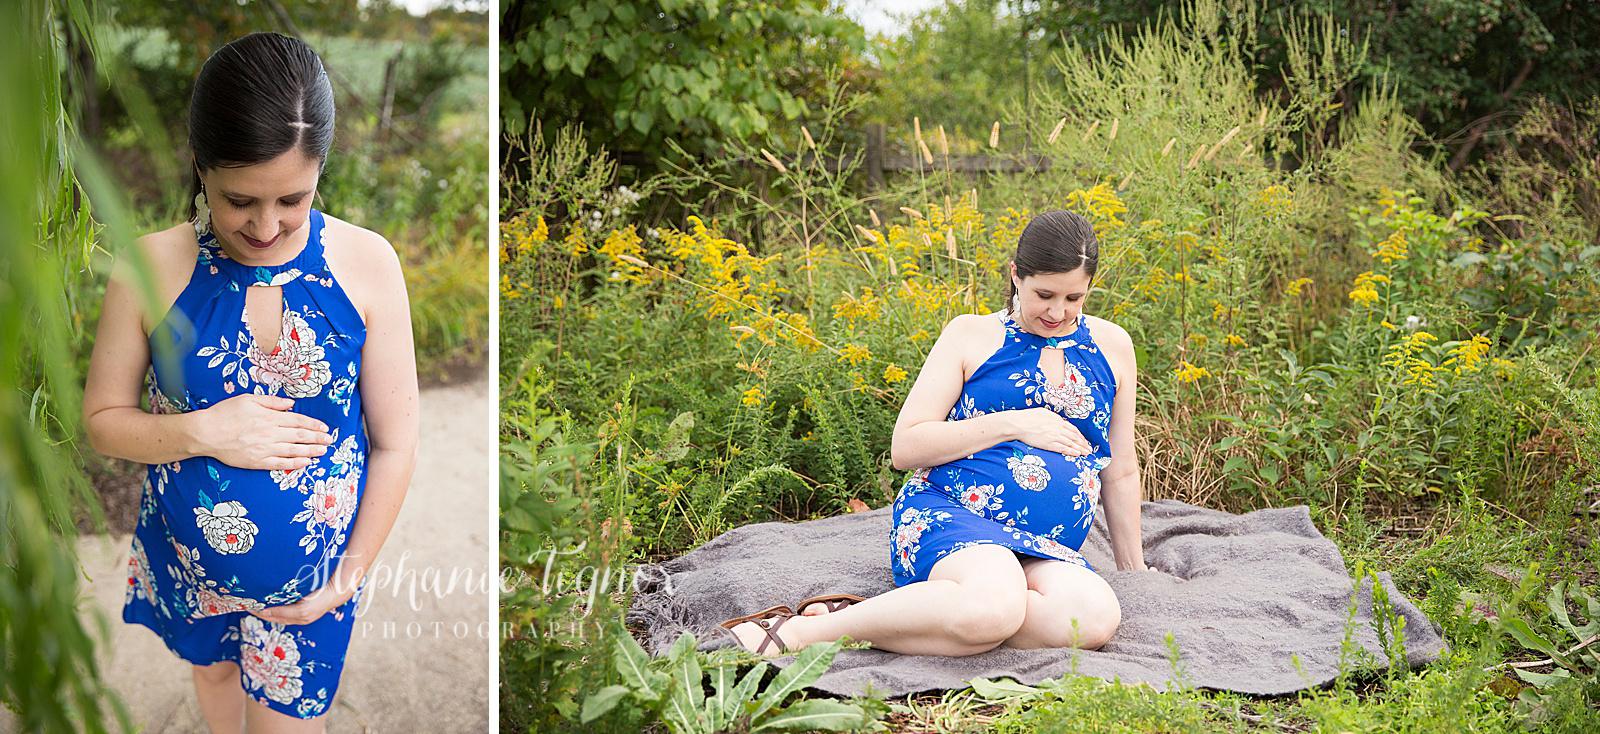 Stephanie Tignor Photography | Fredericksburg VA Maternity Photographer | Warrenton VA Maternity Photographer | Stafford VA Maternity Photographer | Maternity Photographer | Surrgoate, surrogacy, surrogate pregnancy, surrogate journey, infertility journey, surrogate family